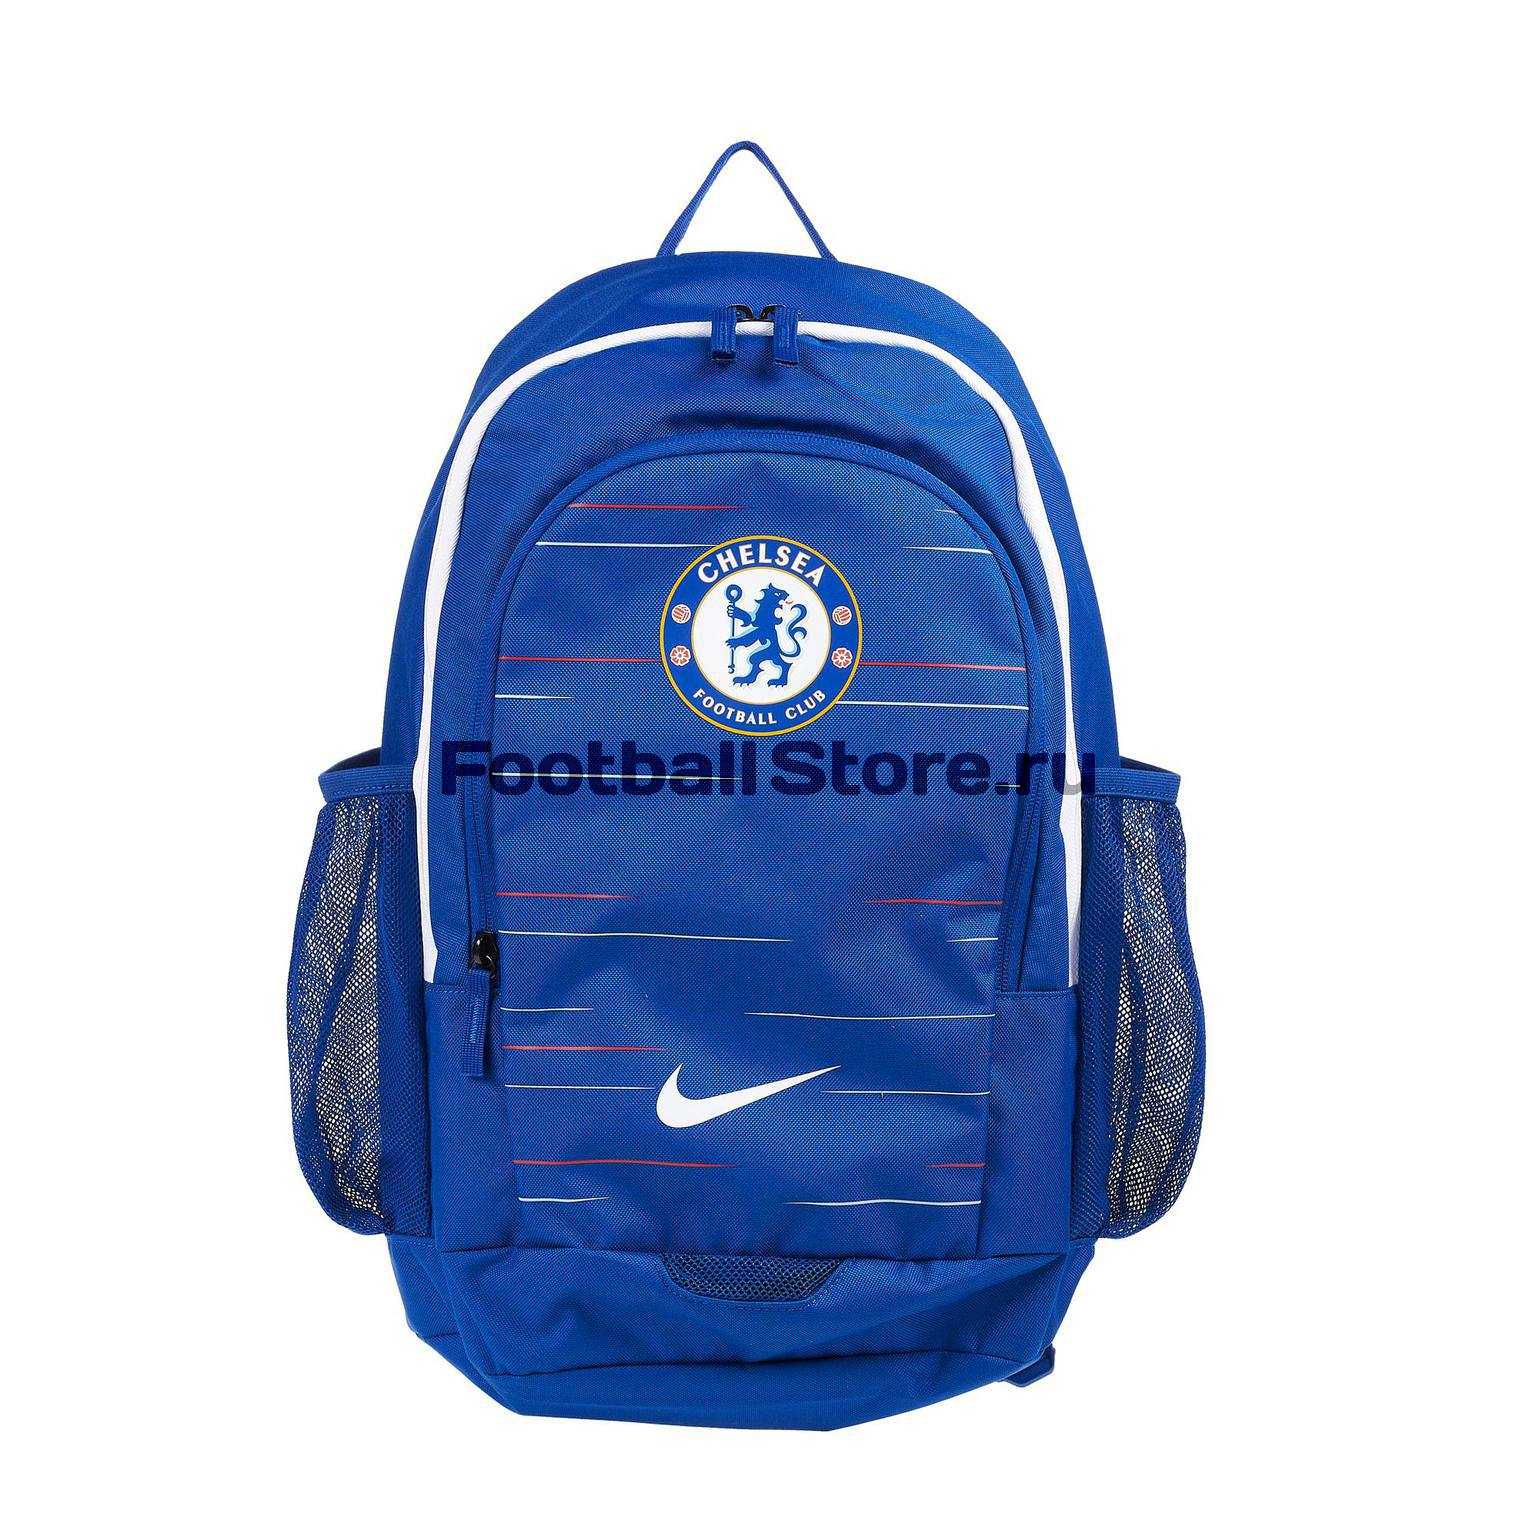 Рюкзак Nike Chelsea BA5494-496 chelsea nike перчатки тренировочные nike chelsea gs0353 060